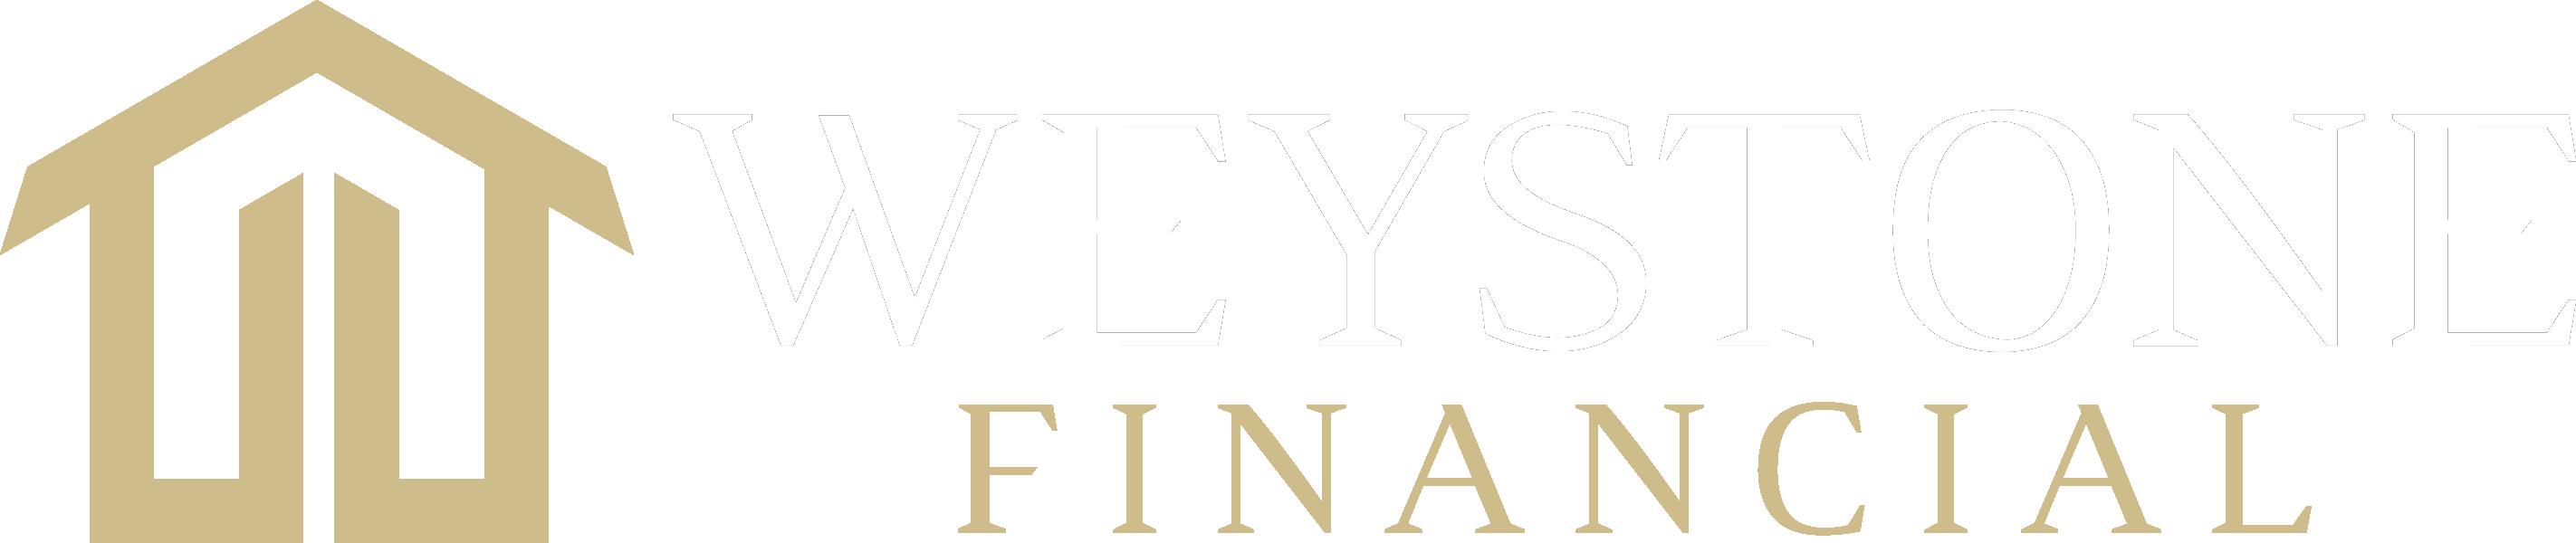 https://www.weystone.co.uk/wp-content/uploads/2021/08/wht-logo.png